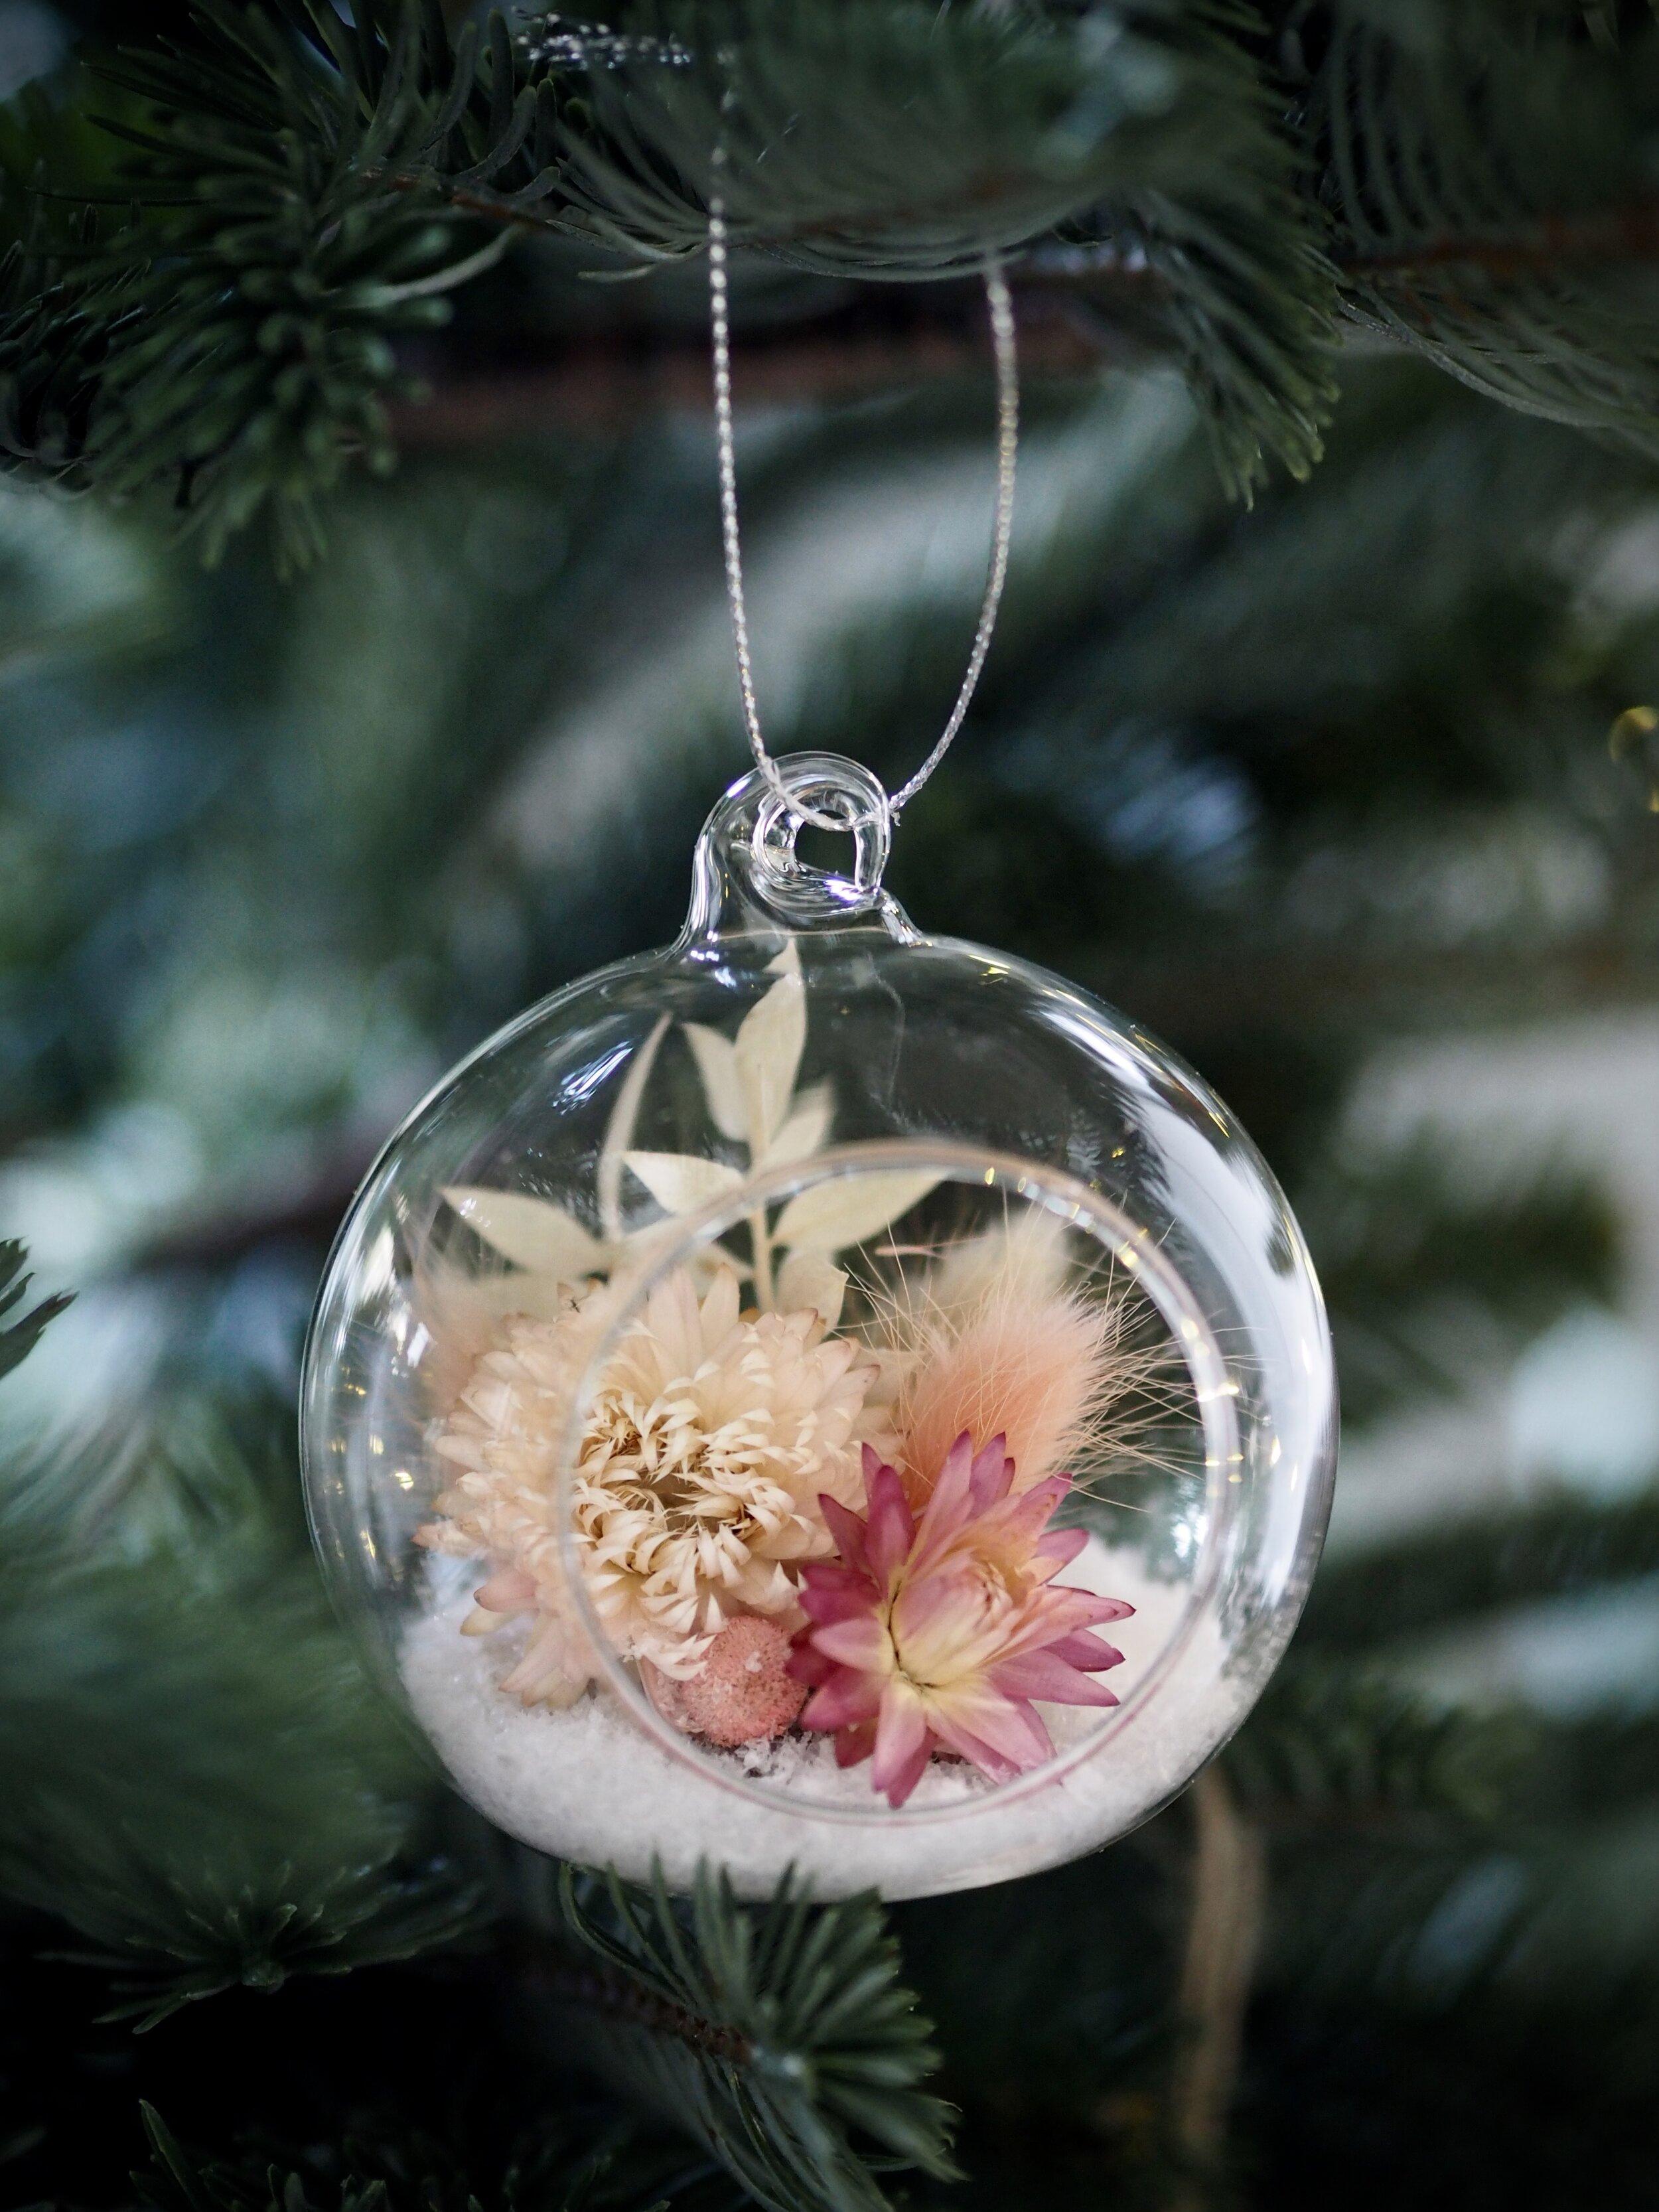 4 Ideas For Handmade Diy Christmas Tree Decorations Melanie Lissack Interiors